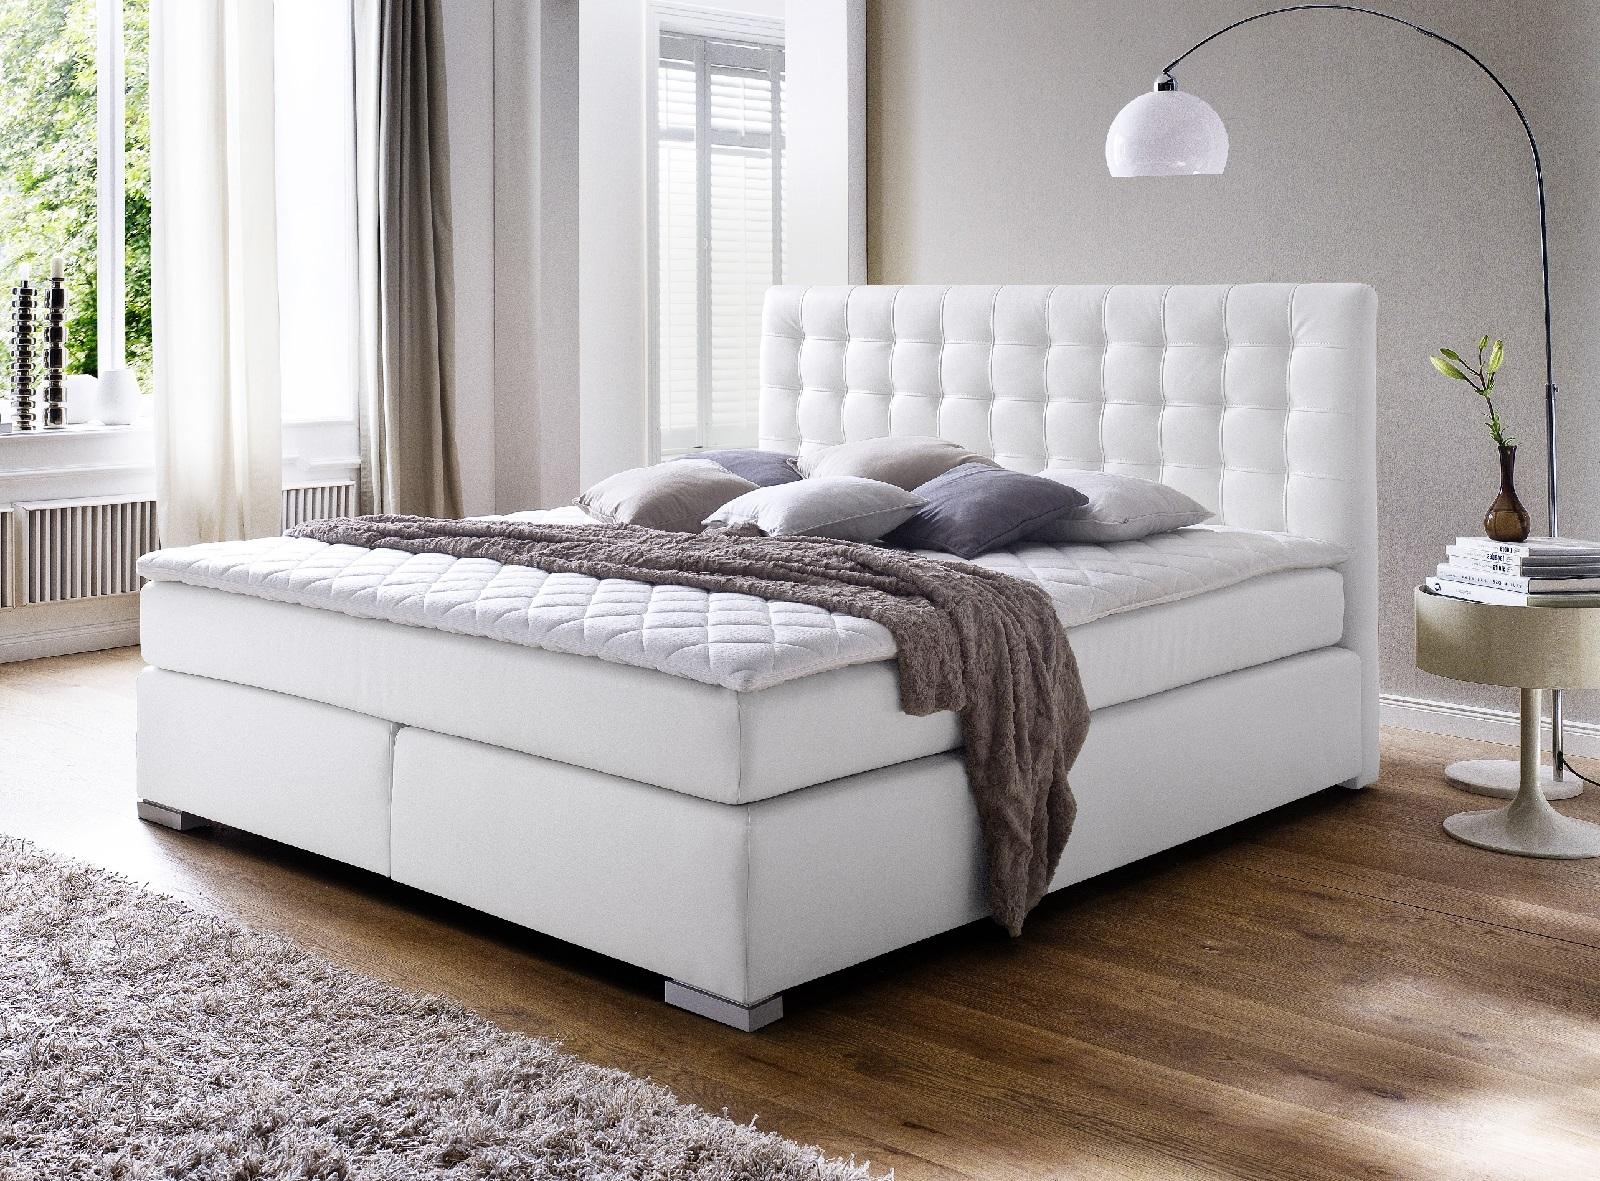 boxspringbett isabelle wei 200cm x 200cm. Black Bedroom Furniture Sets. Home Design Ideas